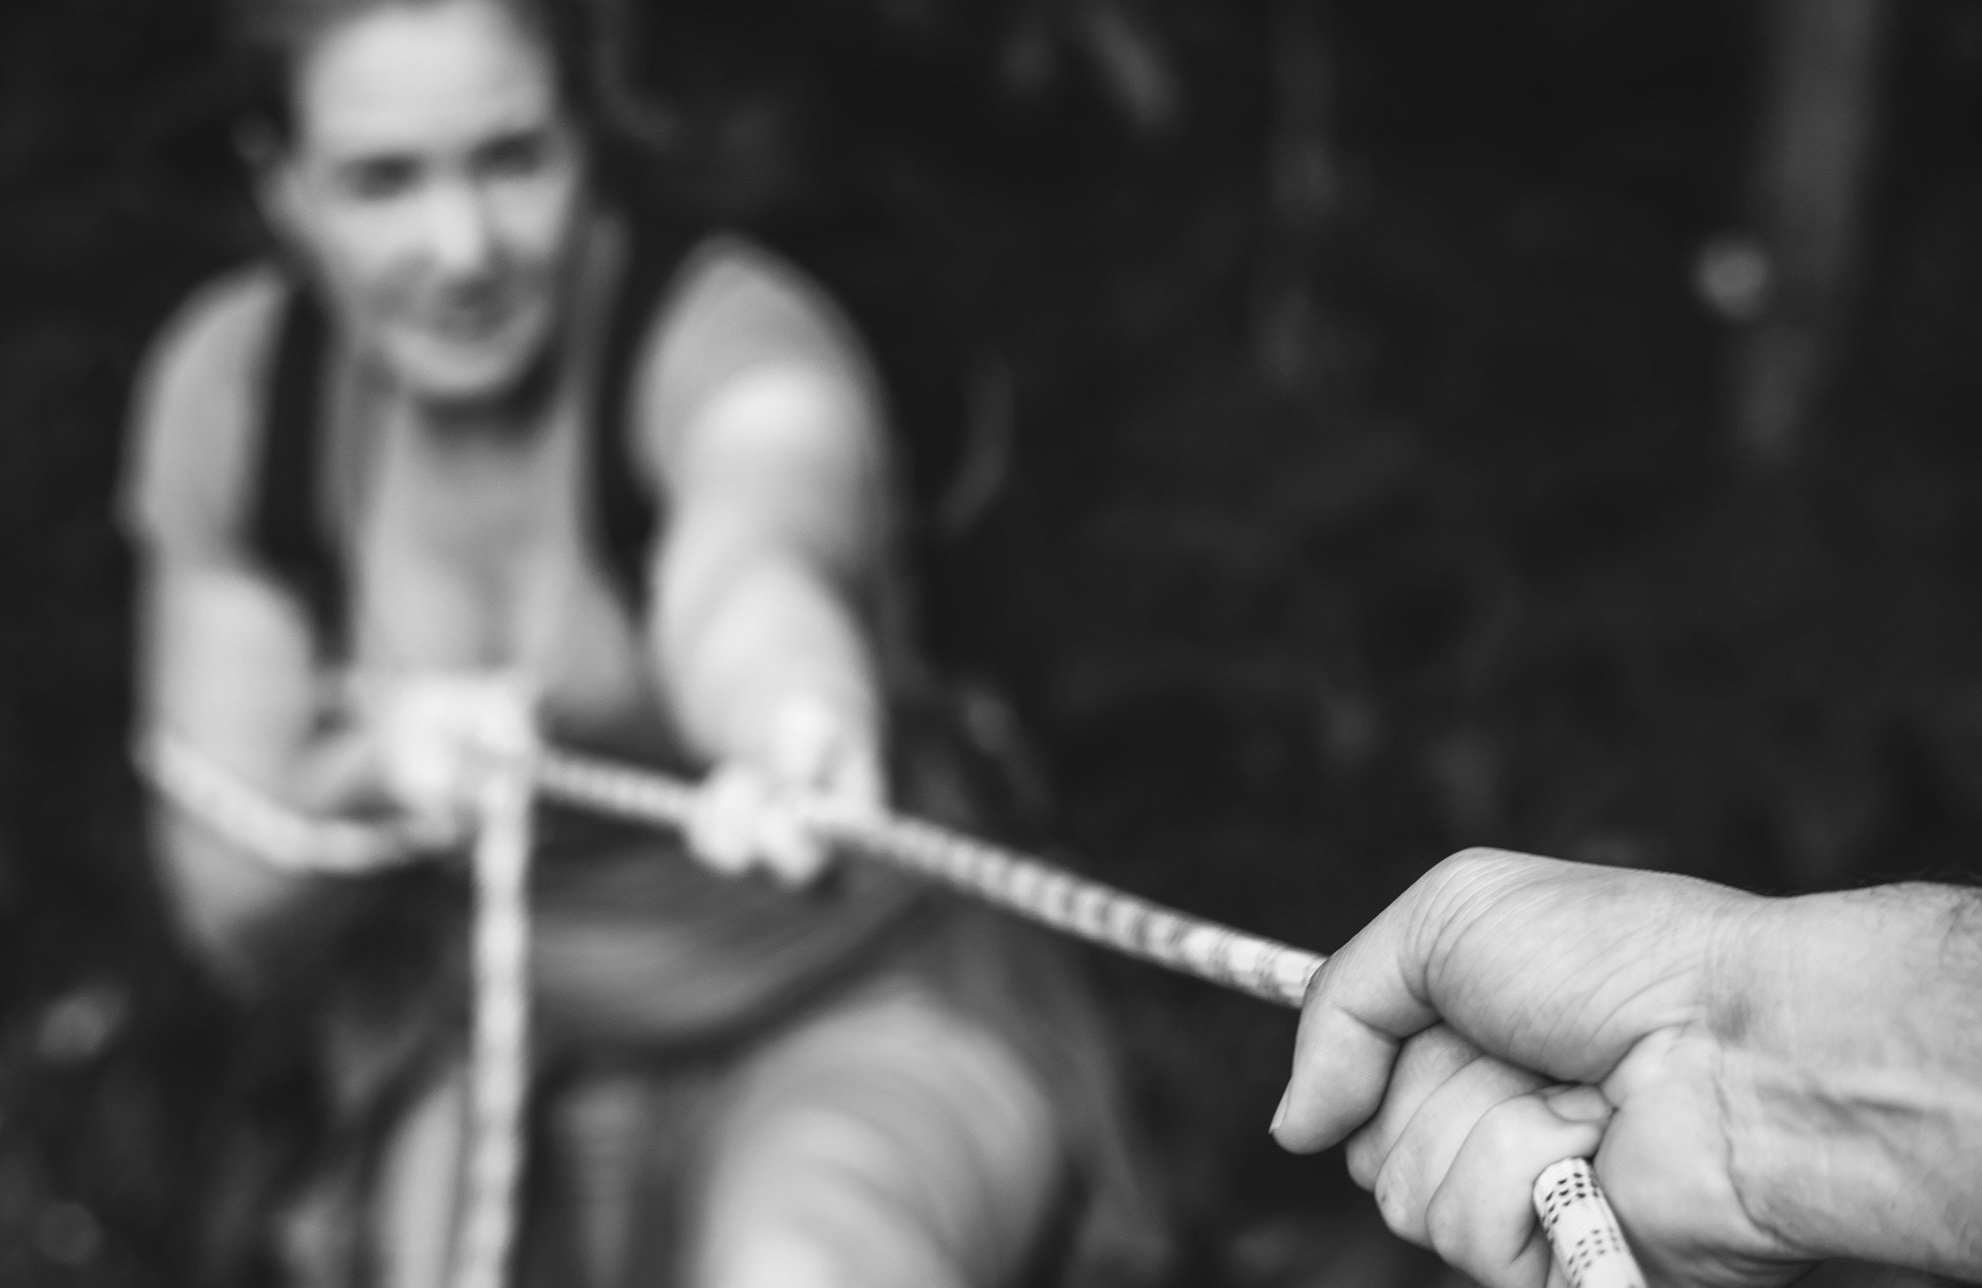 holding+rope.jpg